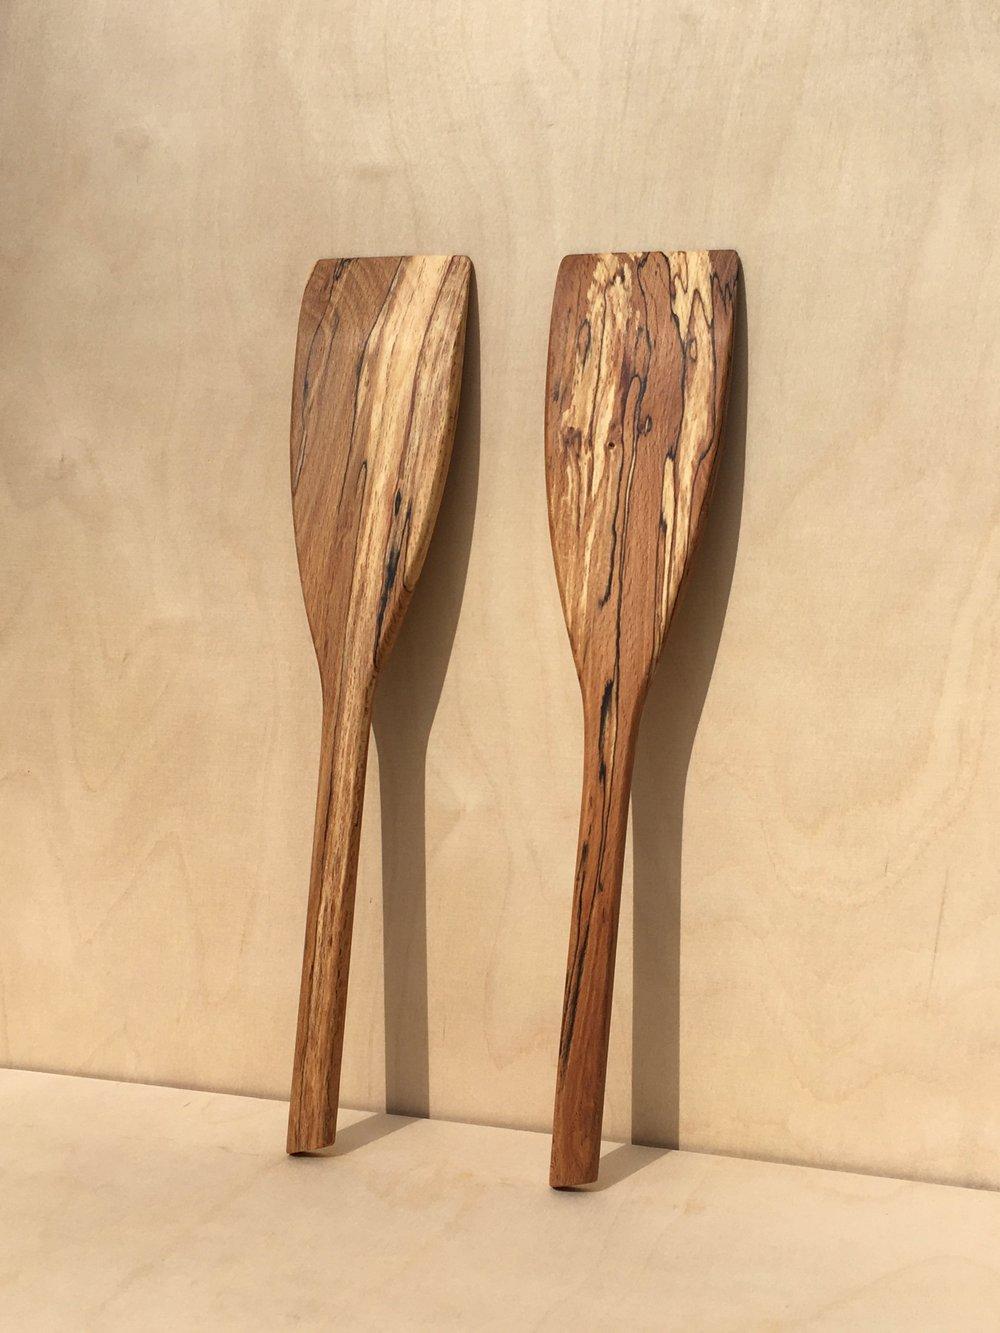 Image of spatule